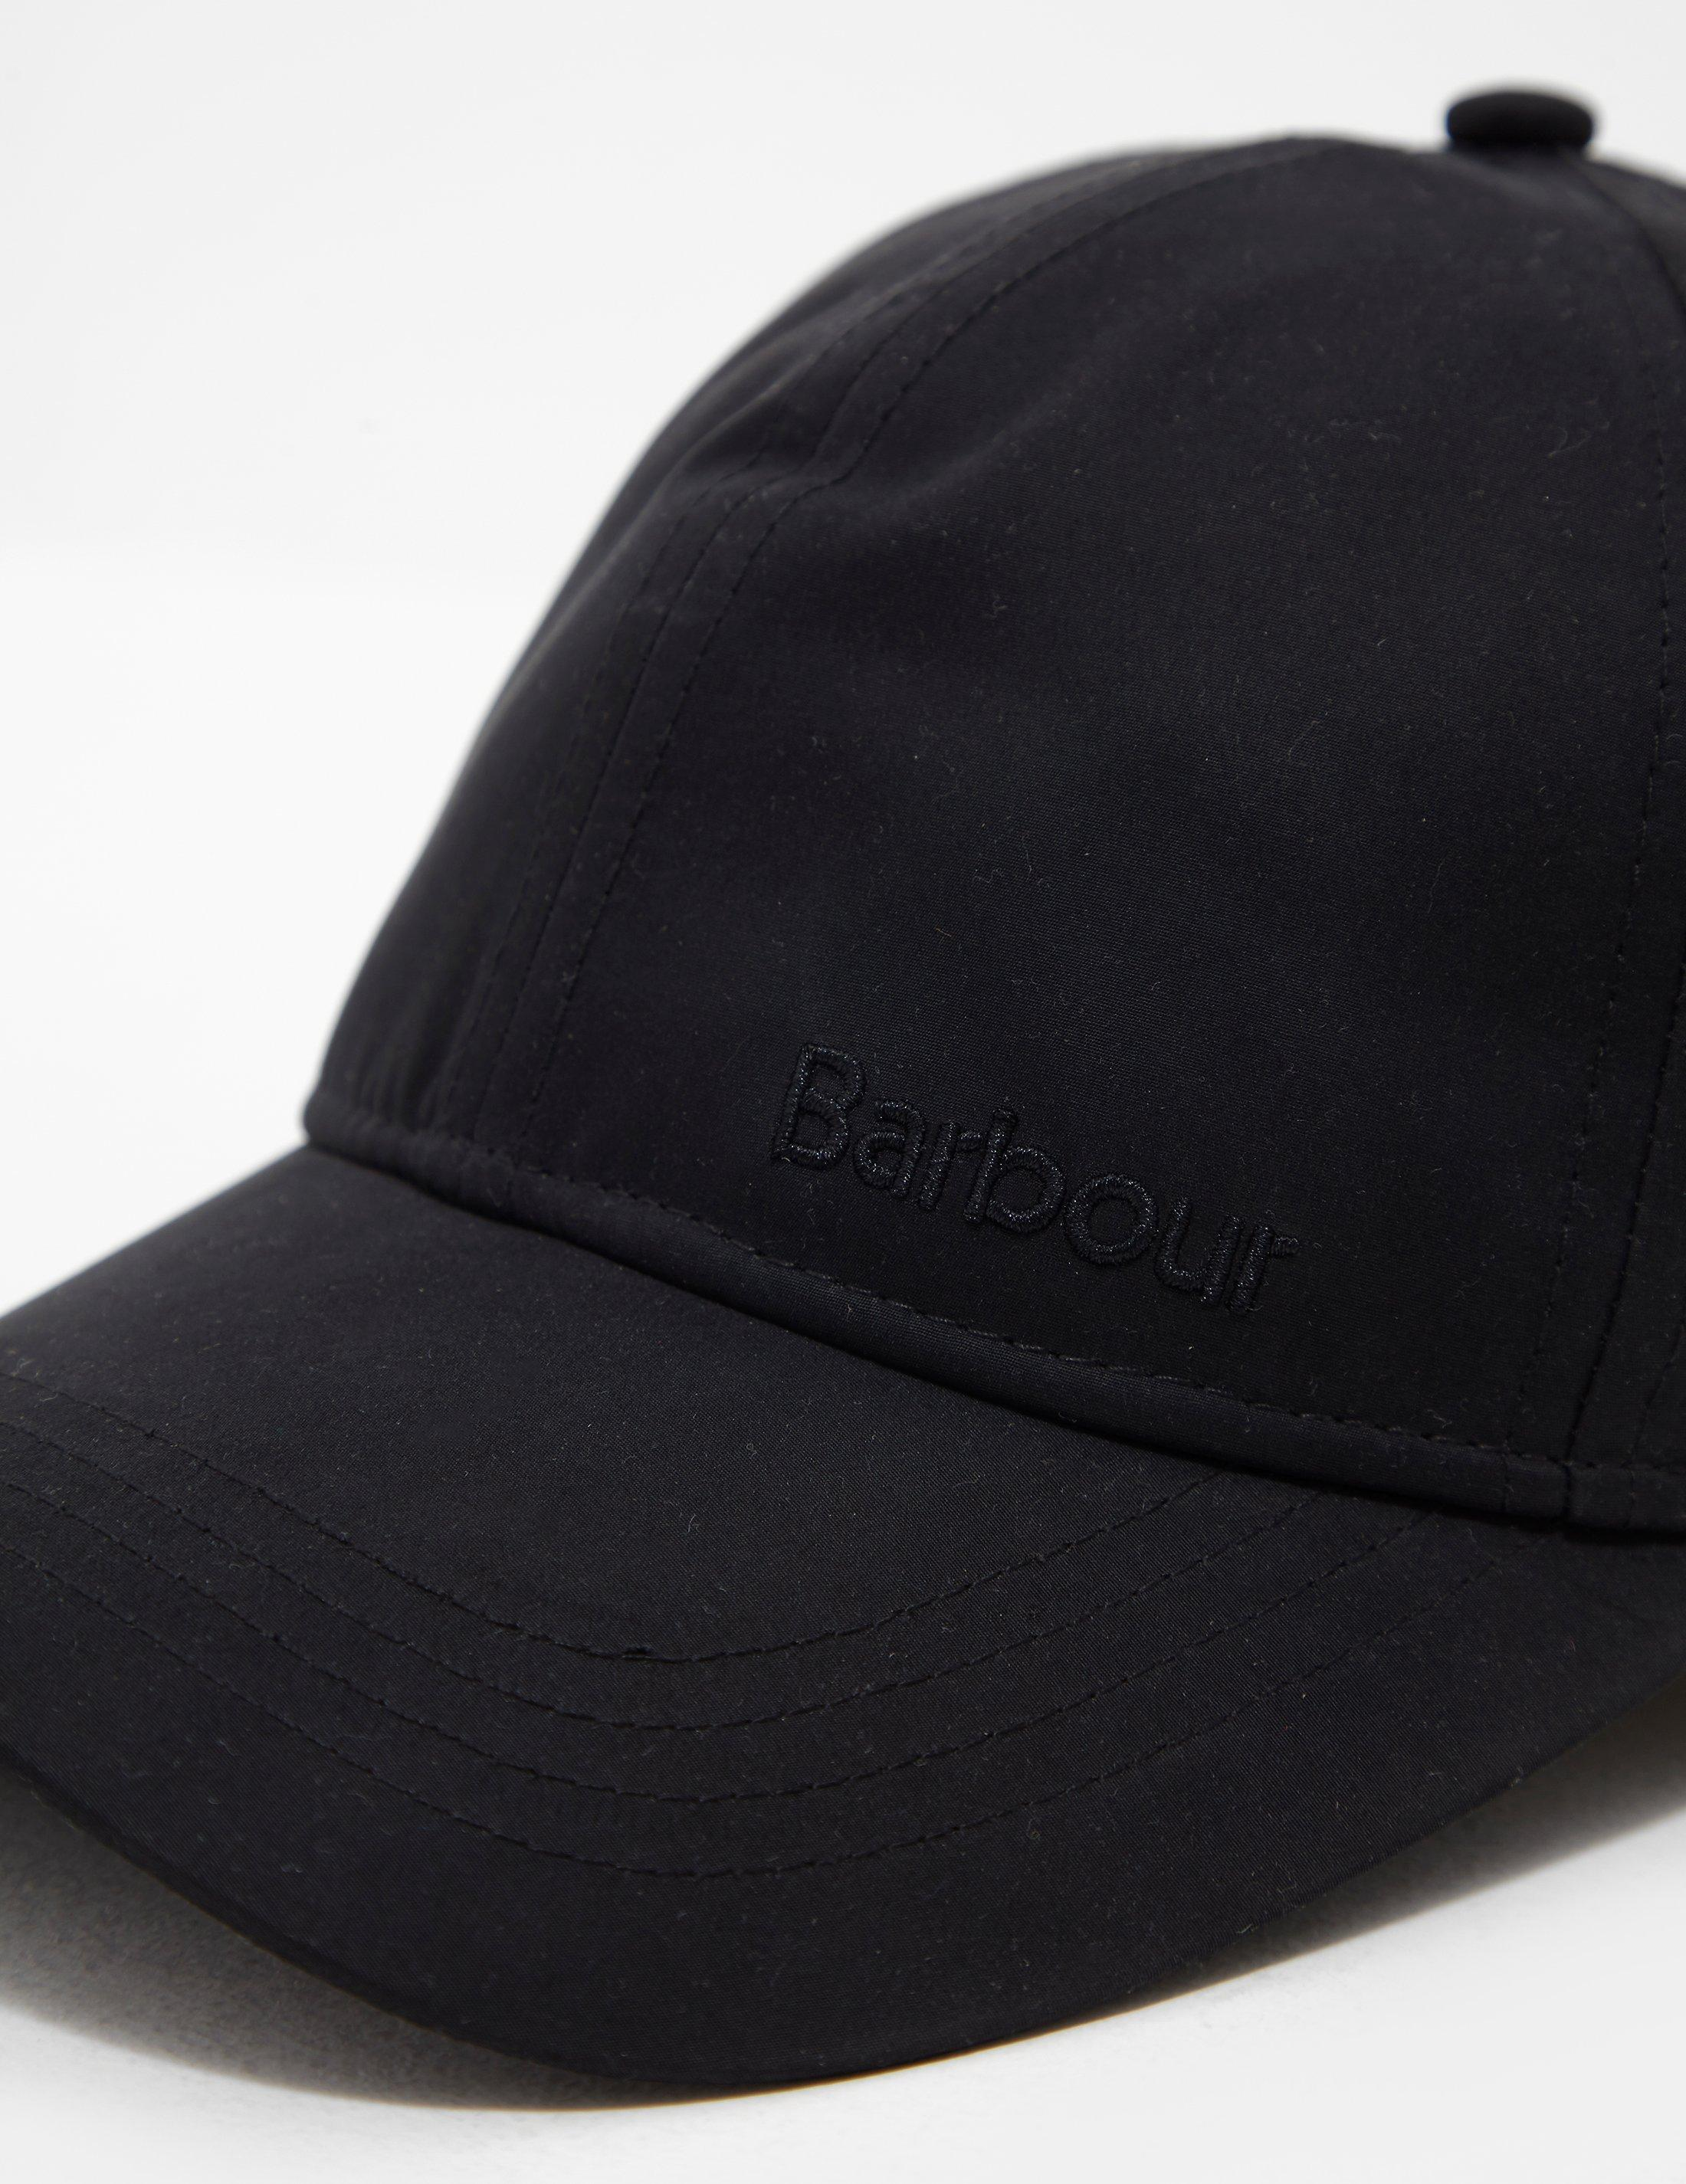 ffffd7290c3cbb Lyst - Barbour Berwick Cap Black in Black for Men